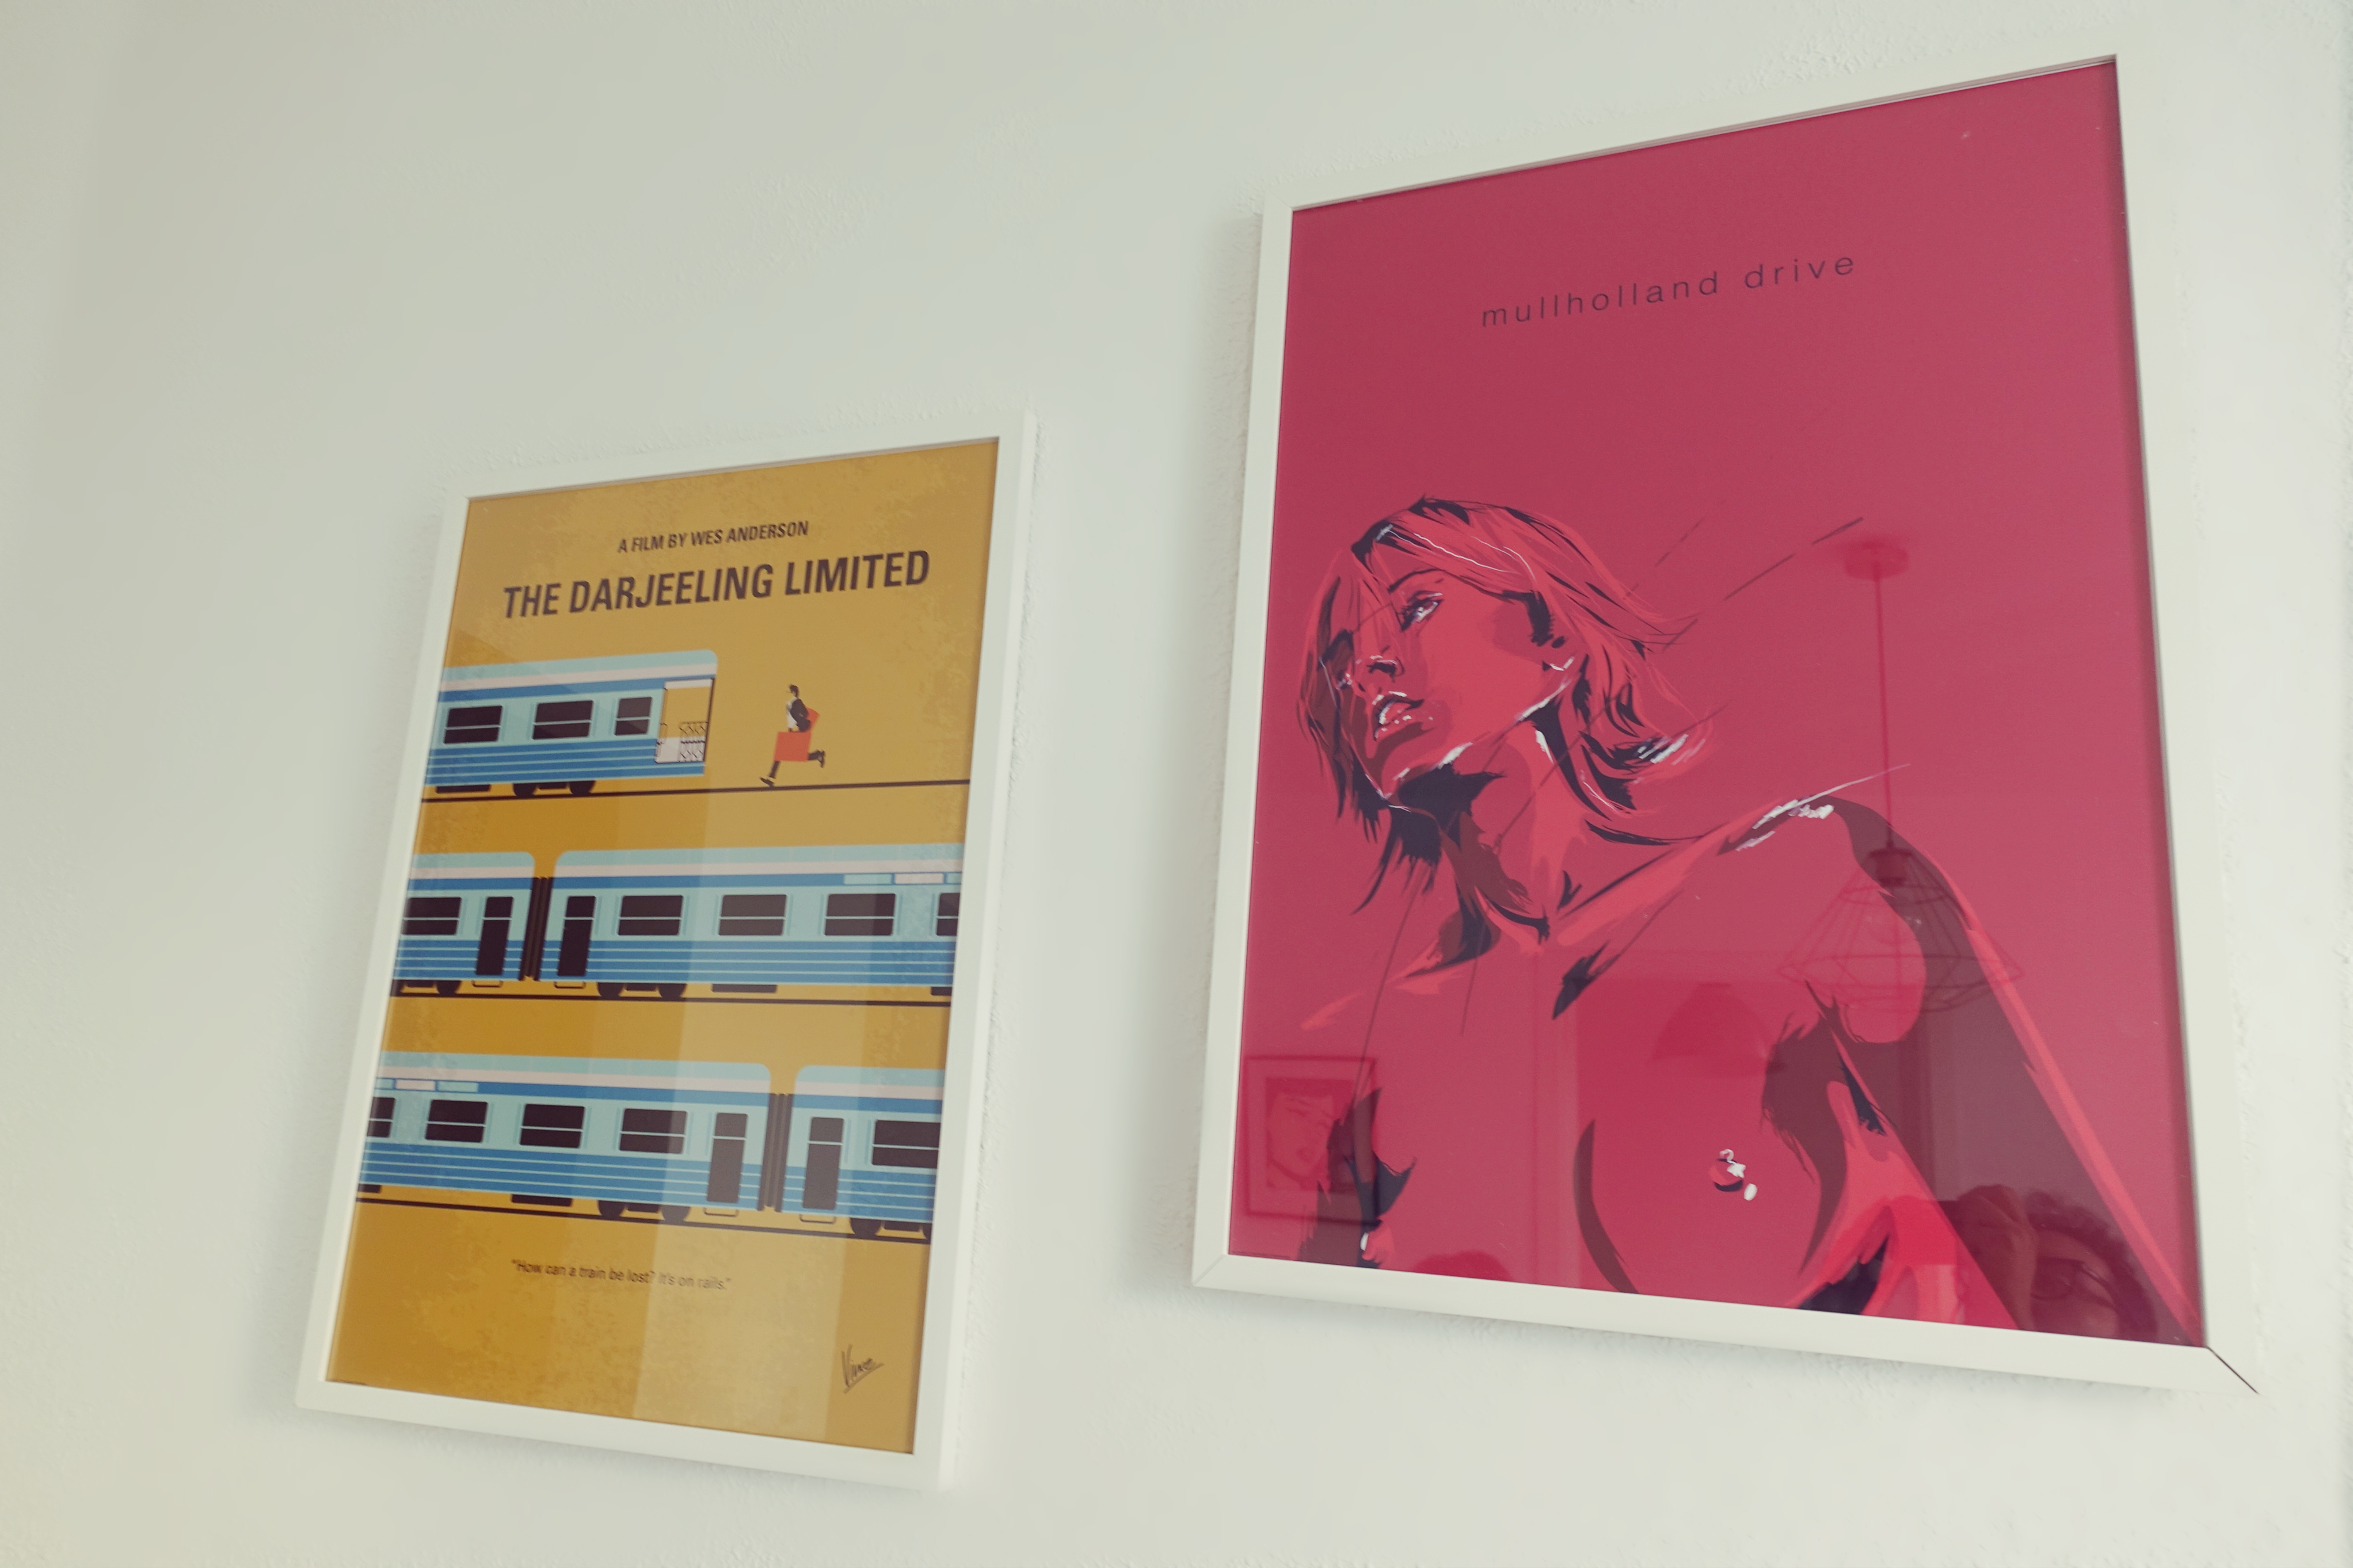 posters-para-decorar-salon-posterlounge-ChicAdicta-influencer-blog-de-moda-PiensaenChic-cuadros-hipsters-Chic-adicta-Piensa-en-Chic-Spain